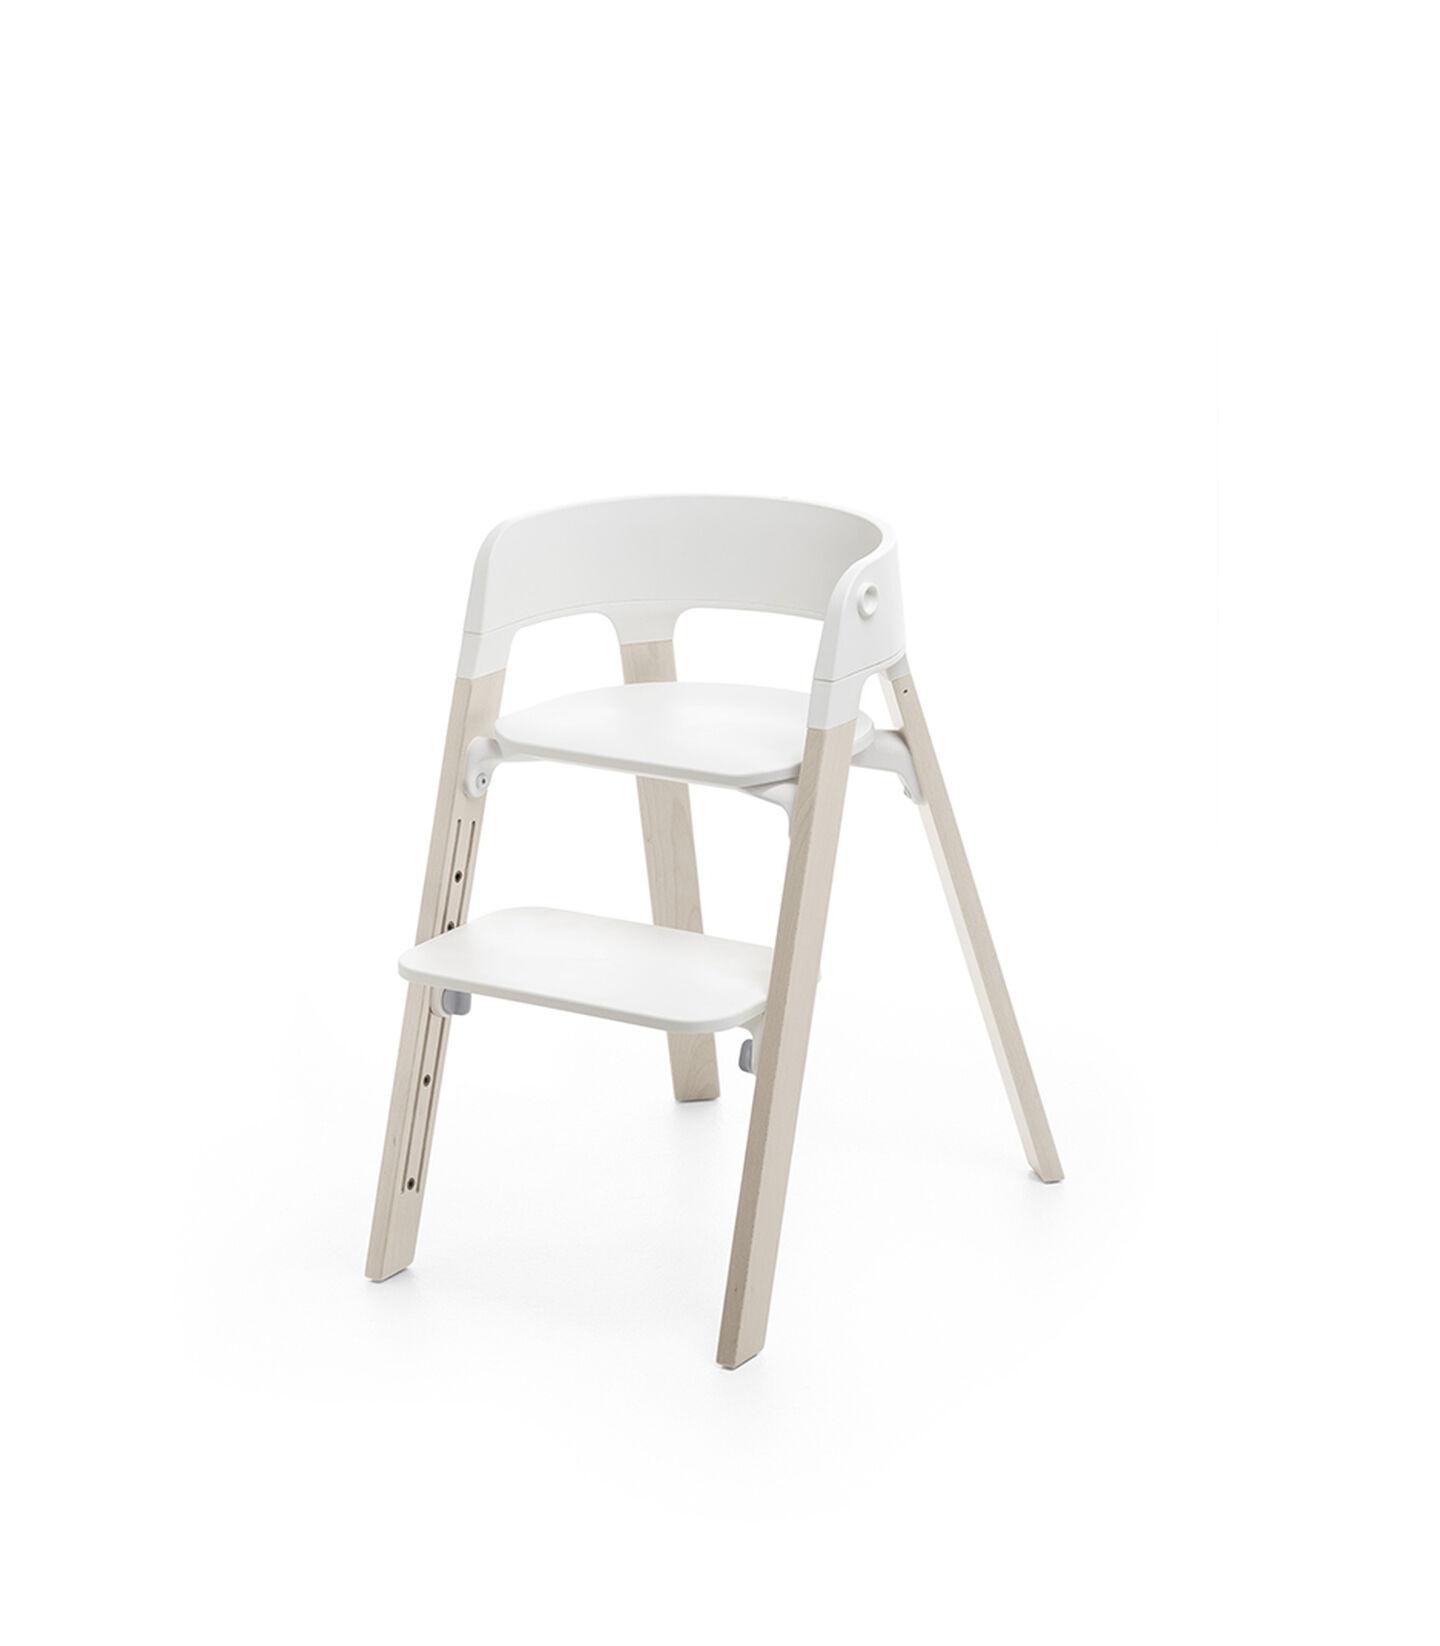 Stokke® Steps™ Chair White Seat Whitewash Legs, Whitewash, mainview view 1